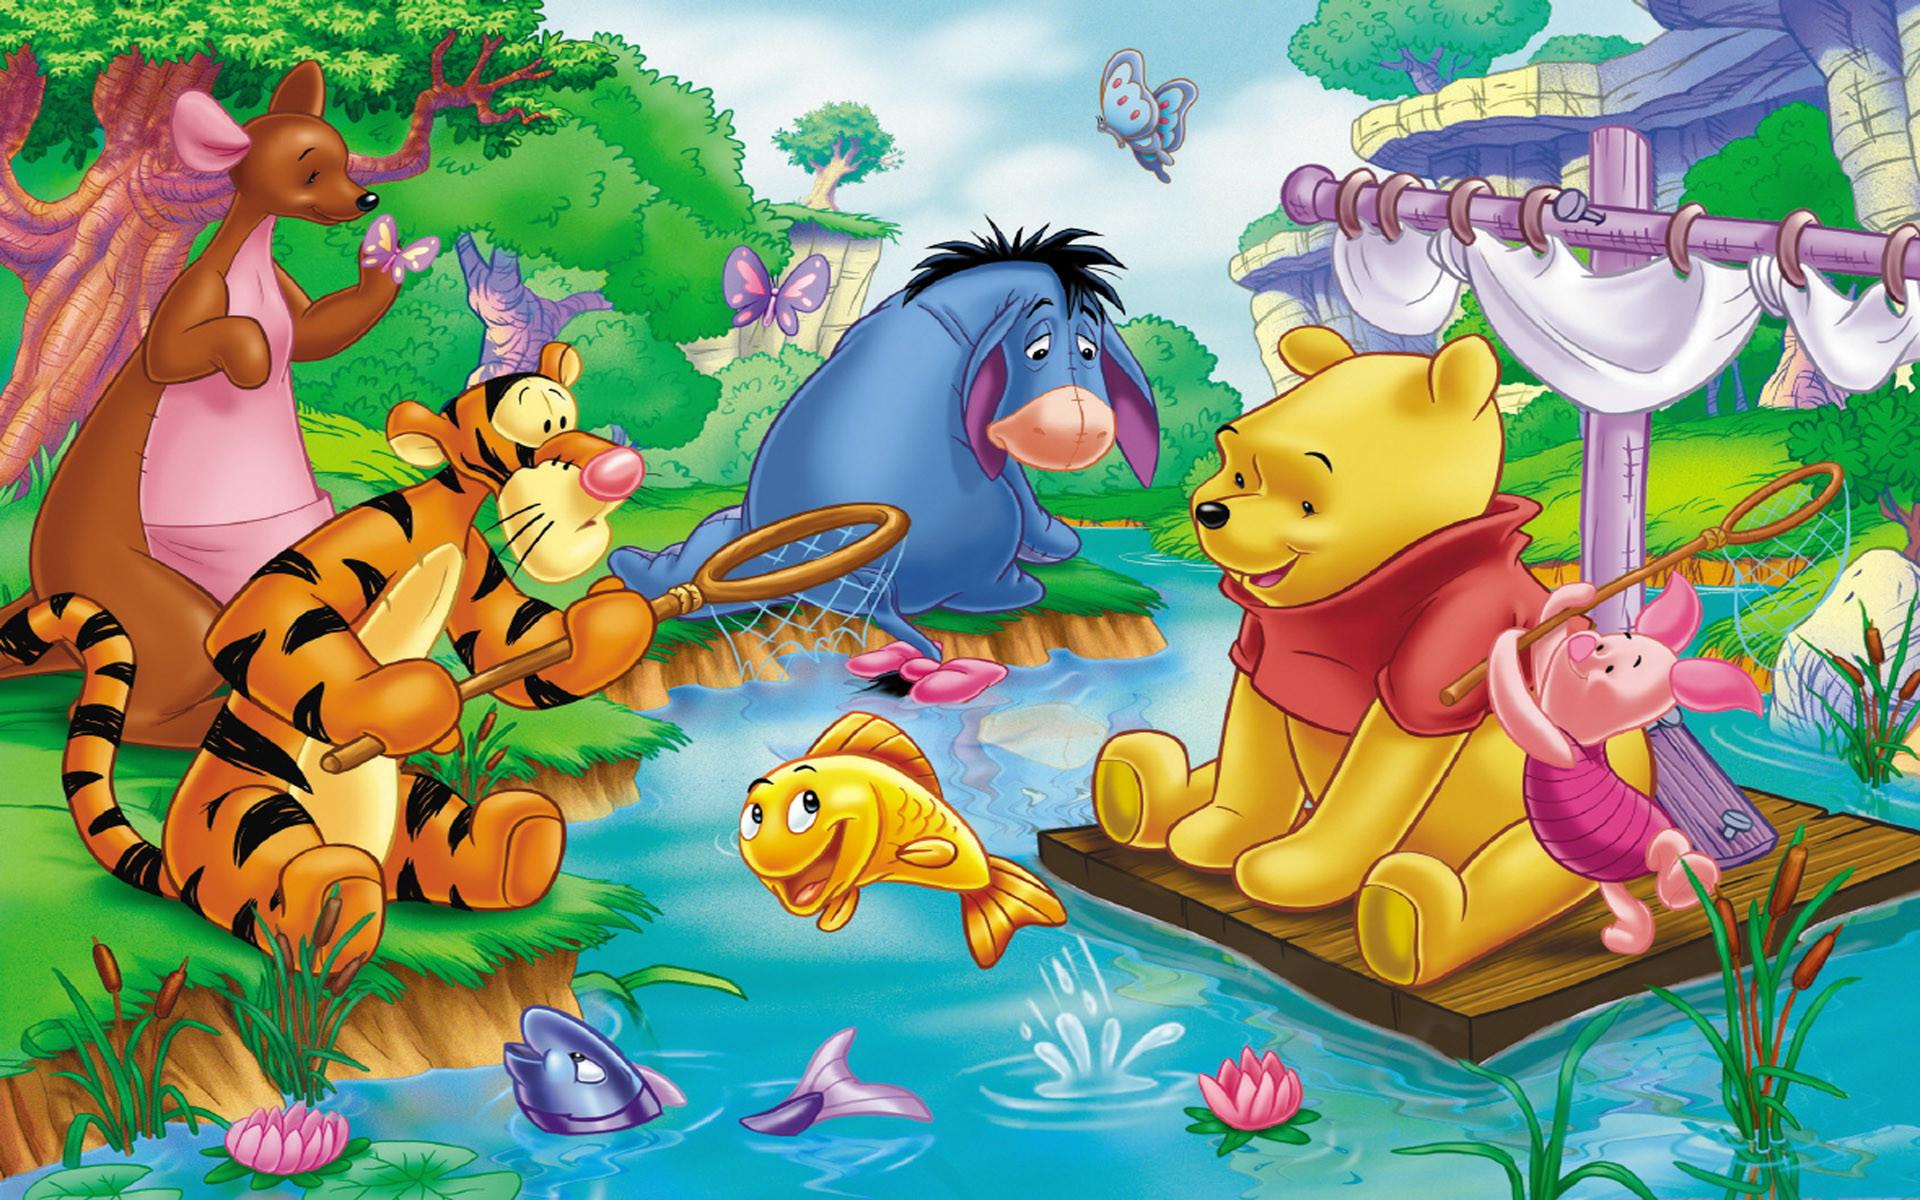 Wallpaper Winnie The Pooh: Winnie The Pooh Desktop Wallpaper (77+ Images